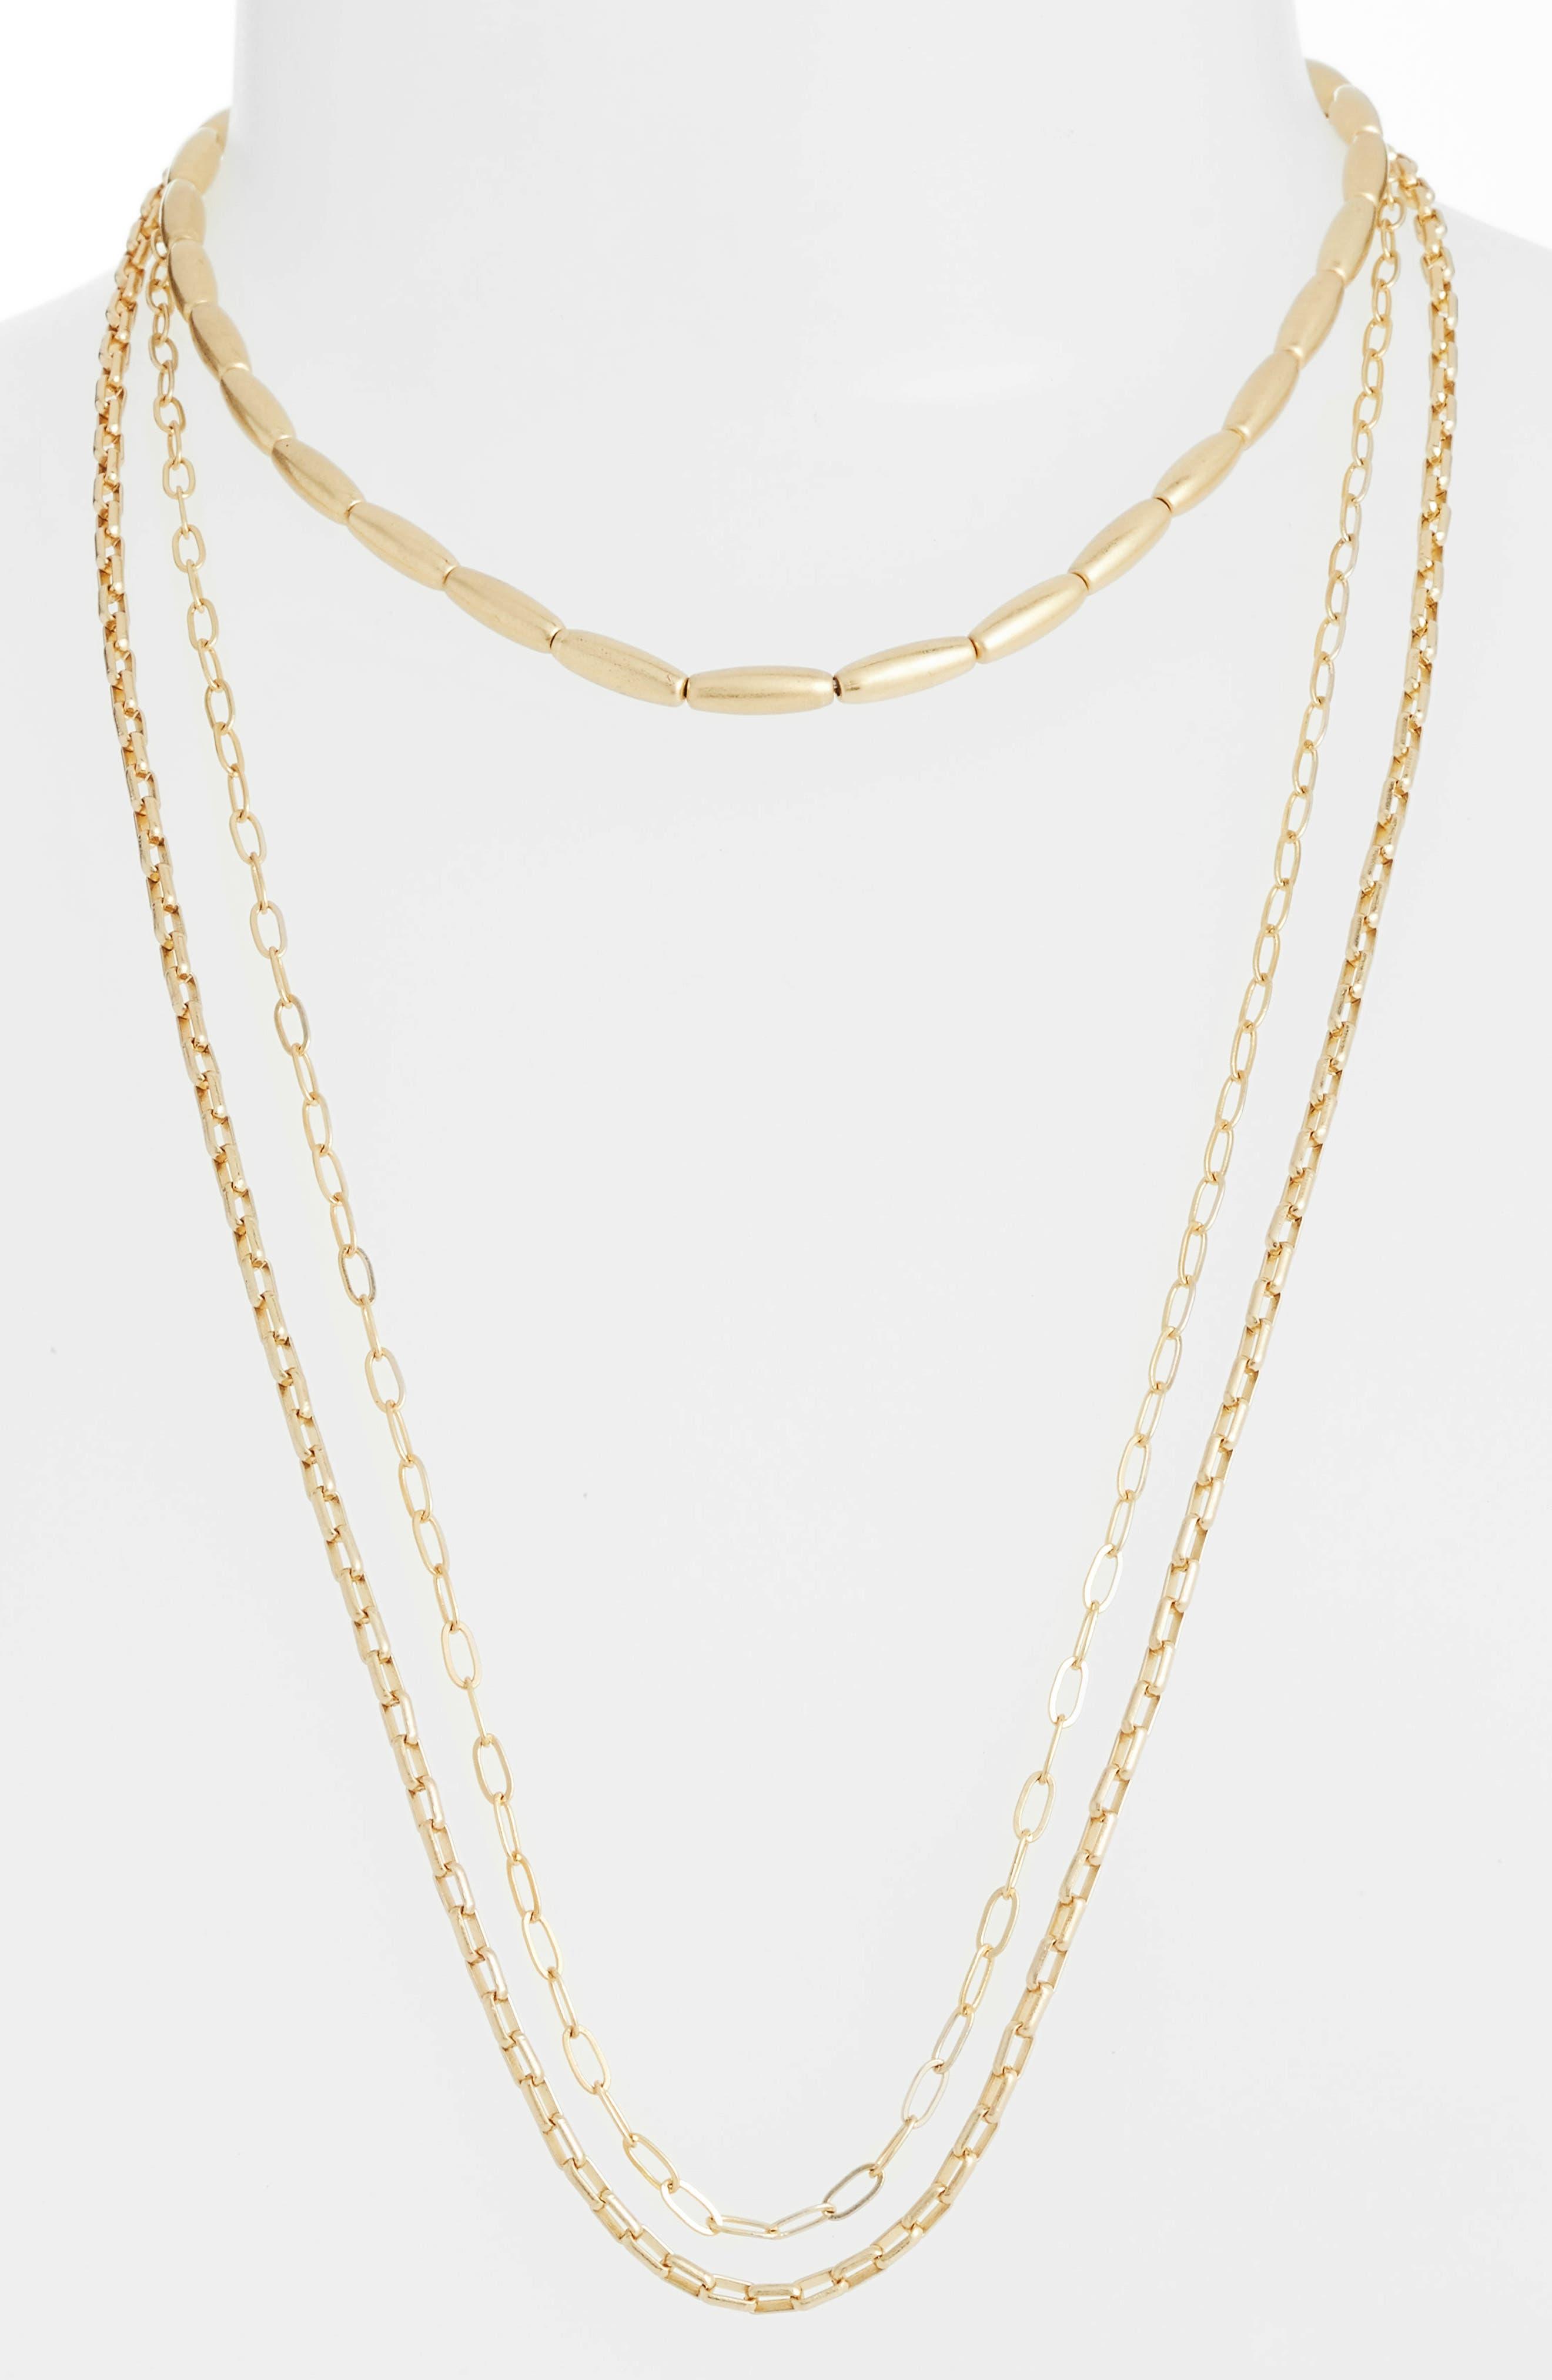 Rebecca Minkoff Sadie Strands Layered Necklace